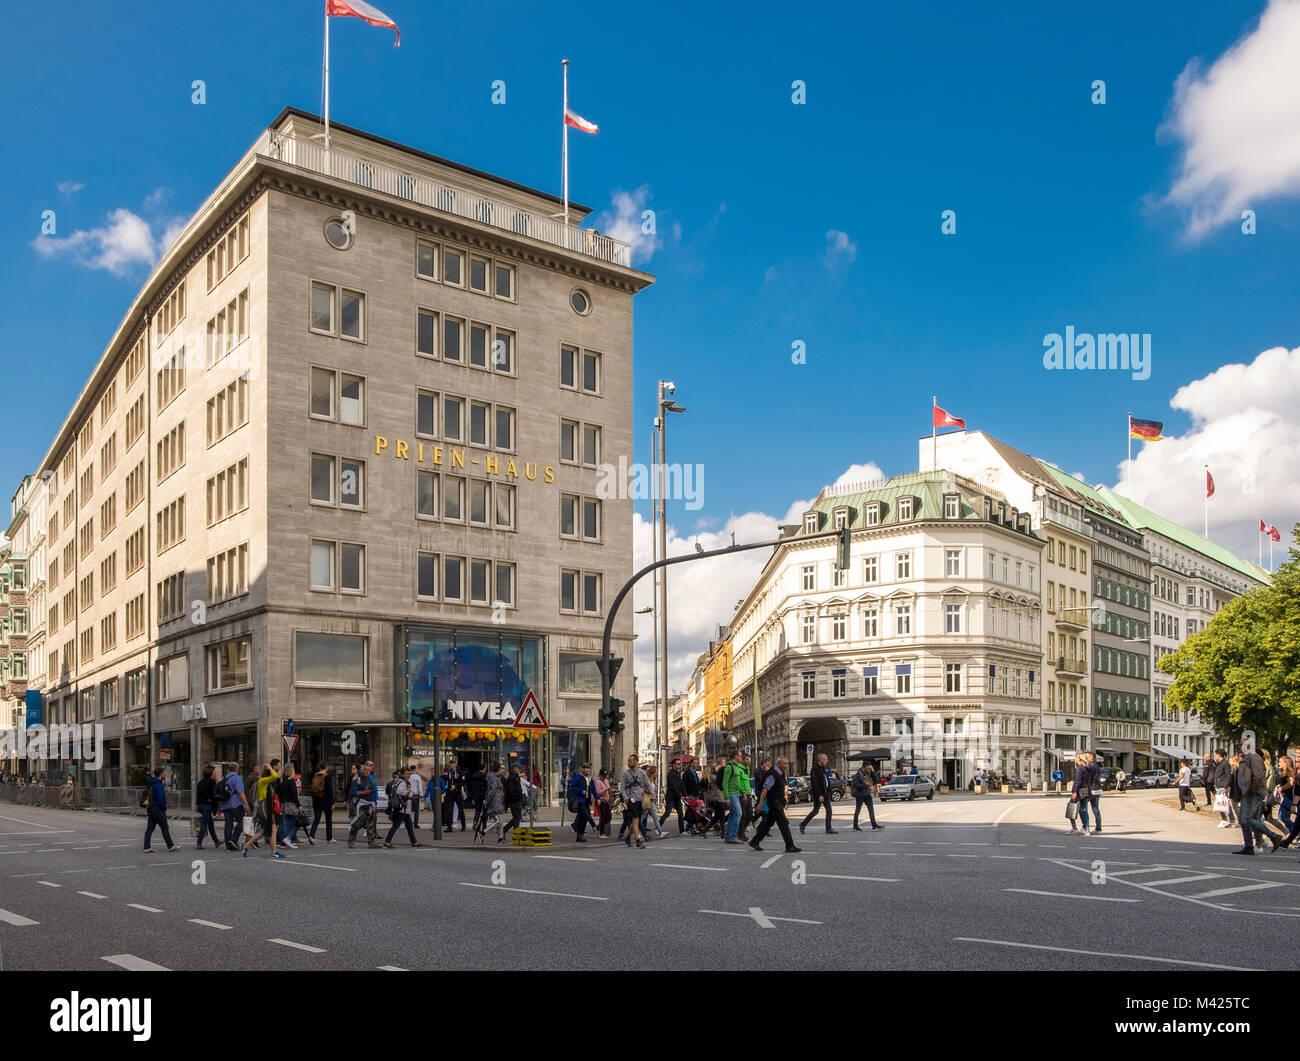 Nivea Haus, the Nivea beauty brand flagship store in Hamburg, Germany - Stock Image